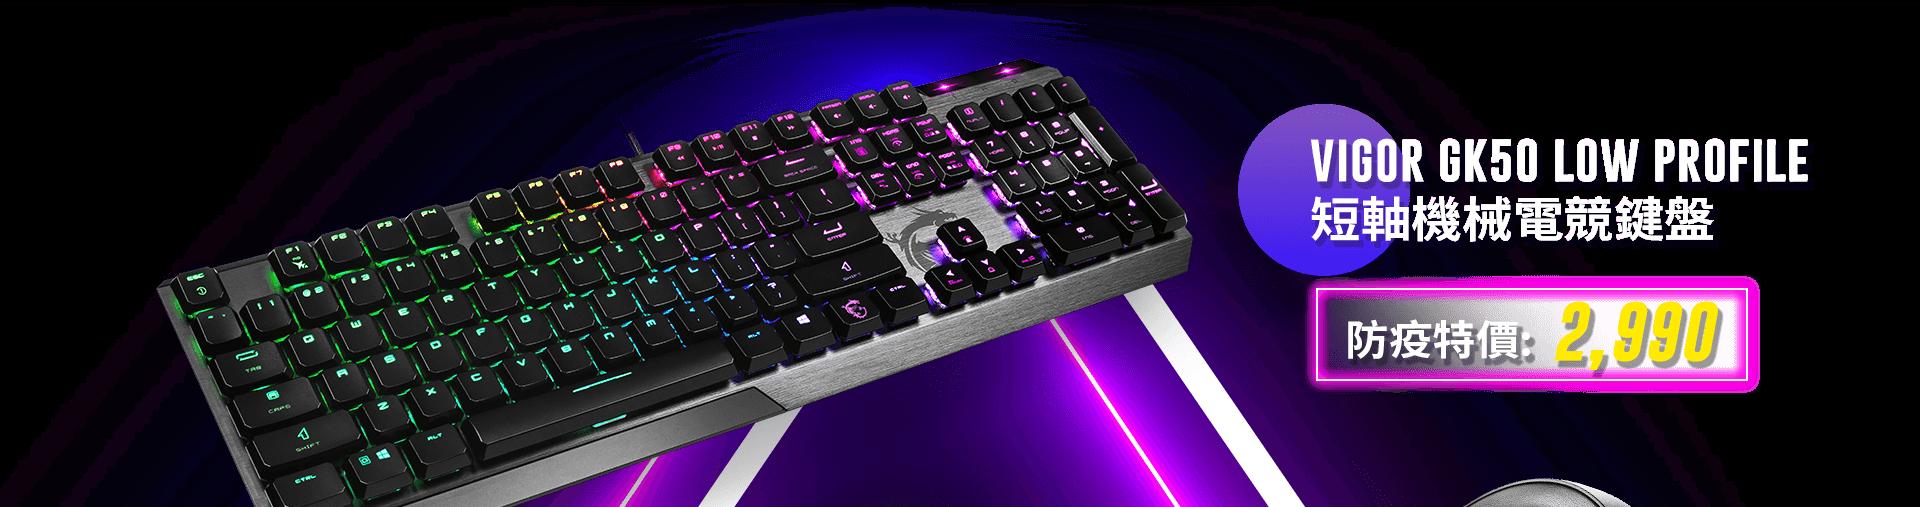 VIGOR GK50 LOW PROFILE 短軸機械電競鍵盤 防疫特價:2,990